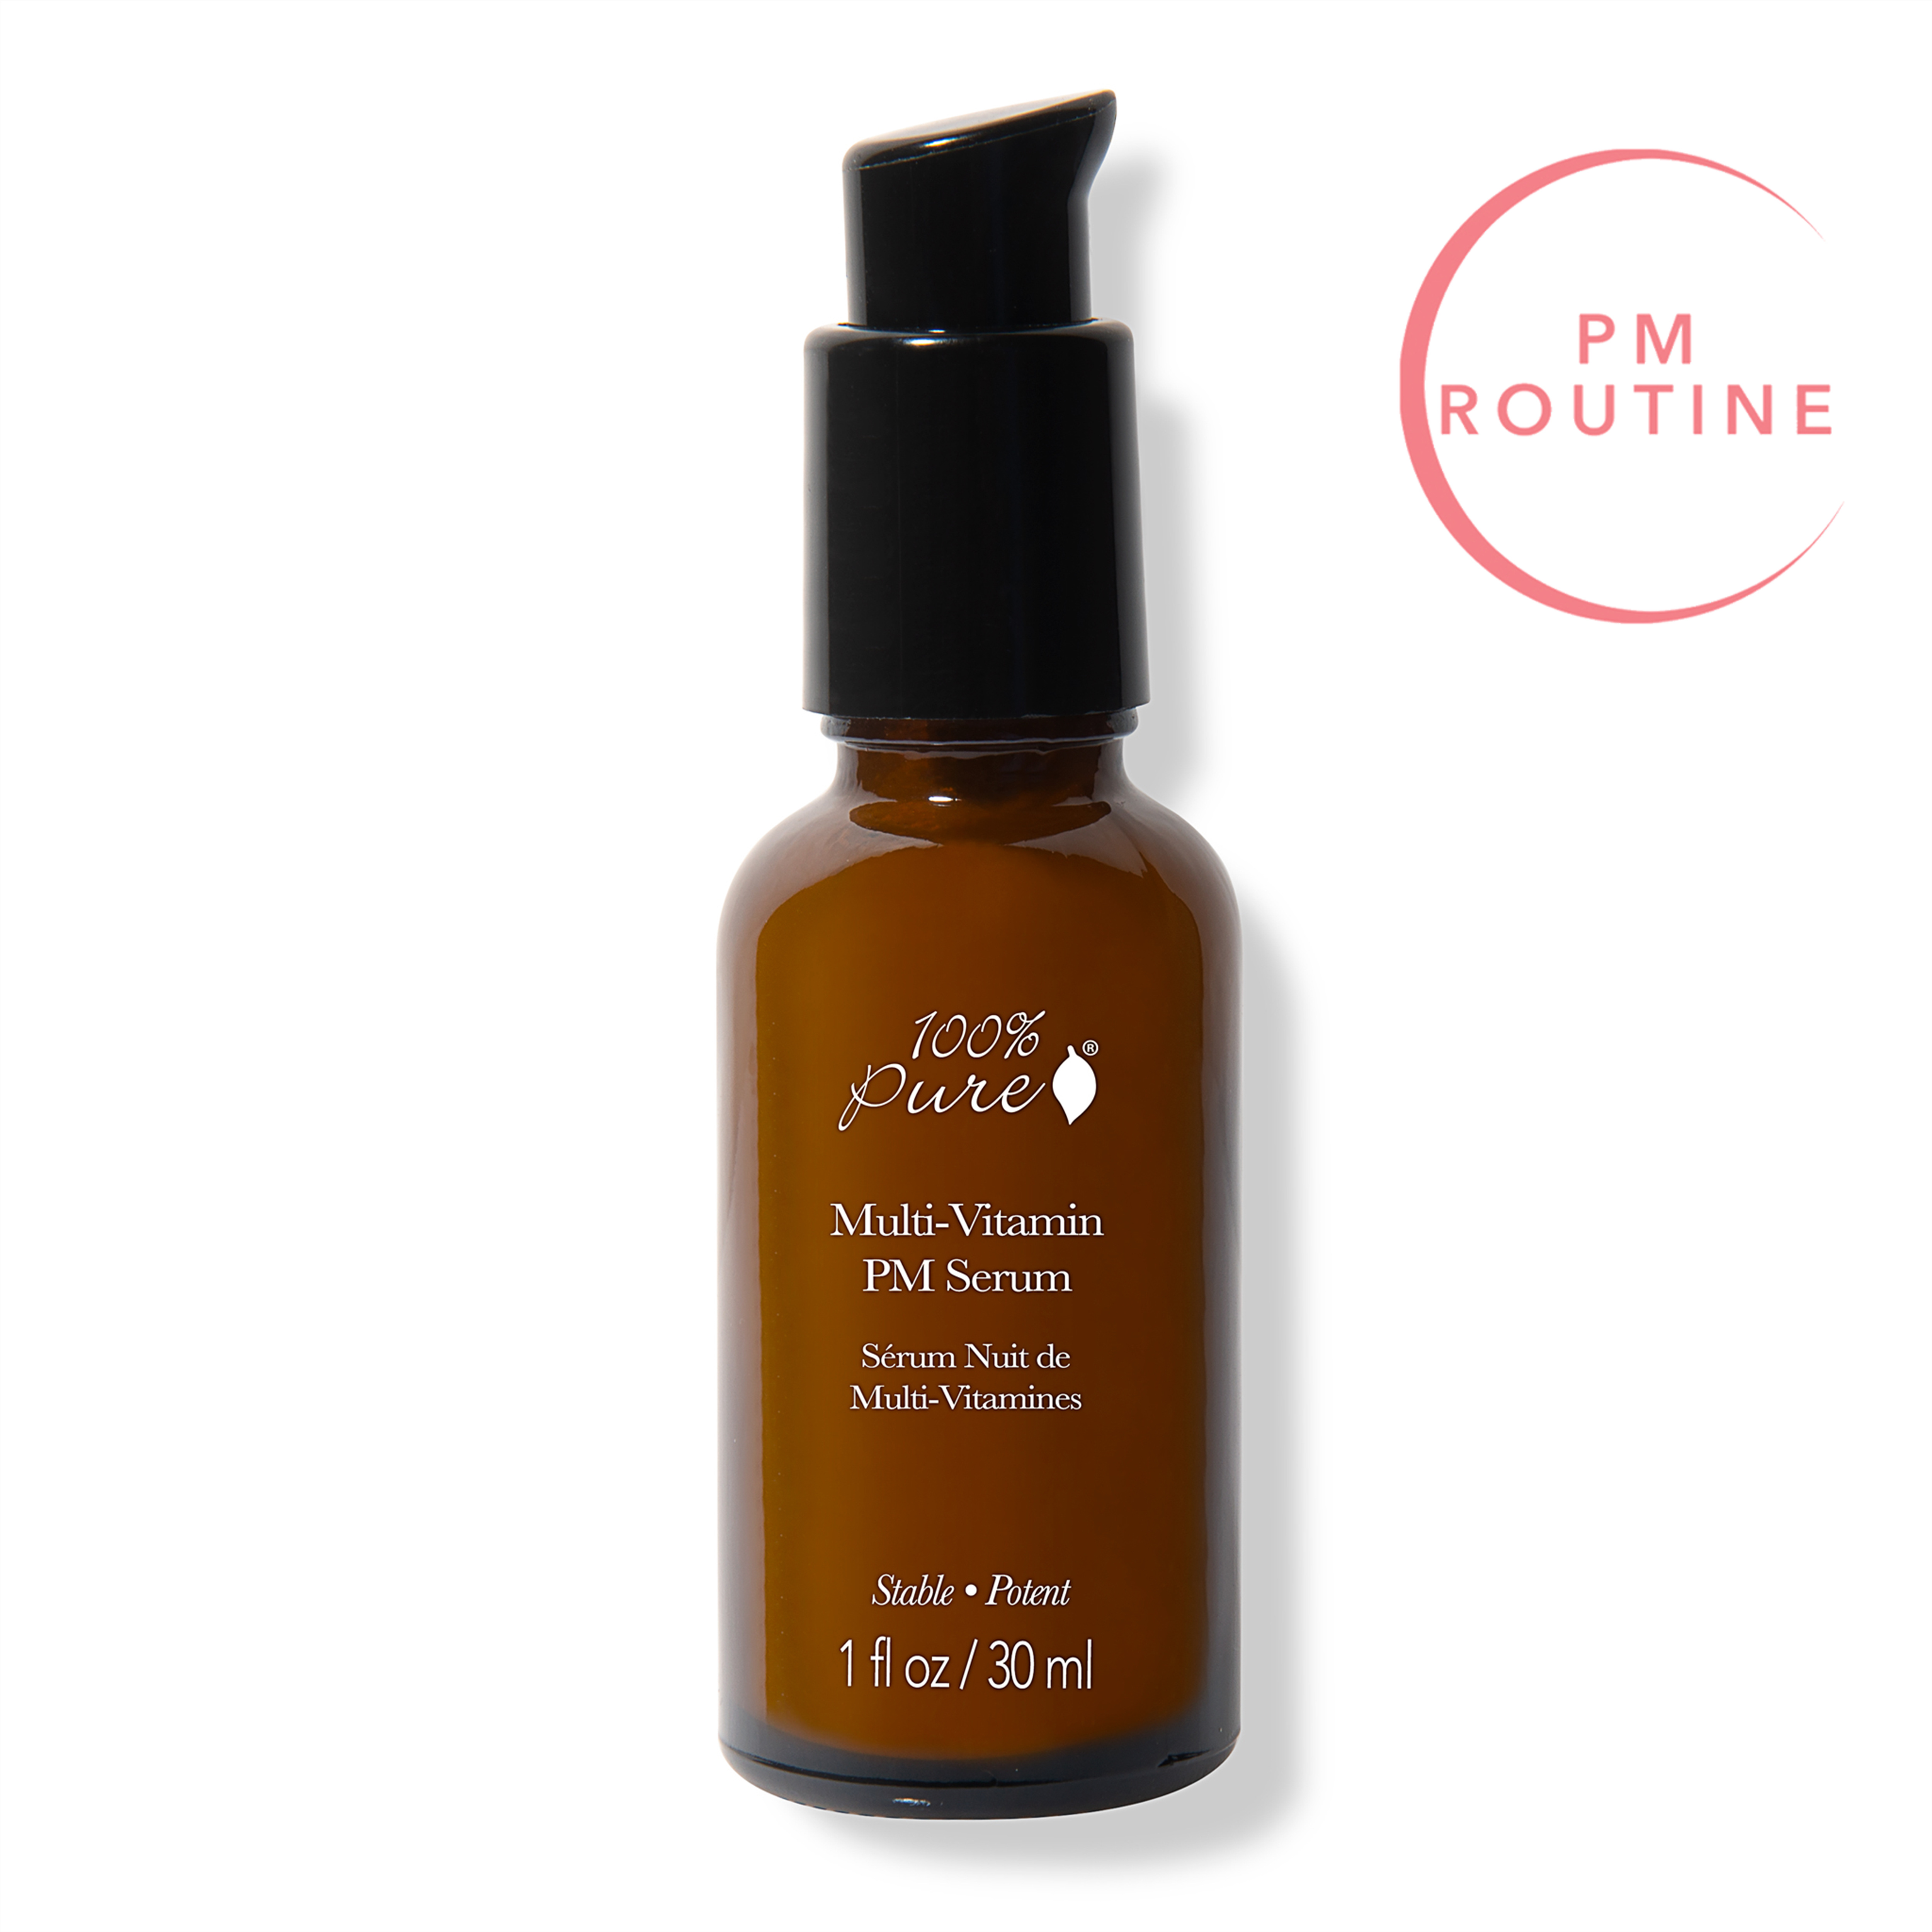 Product Grid - Multi-Vitamin + Antioxidants Potent PM Serum